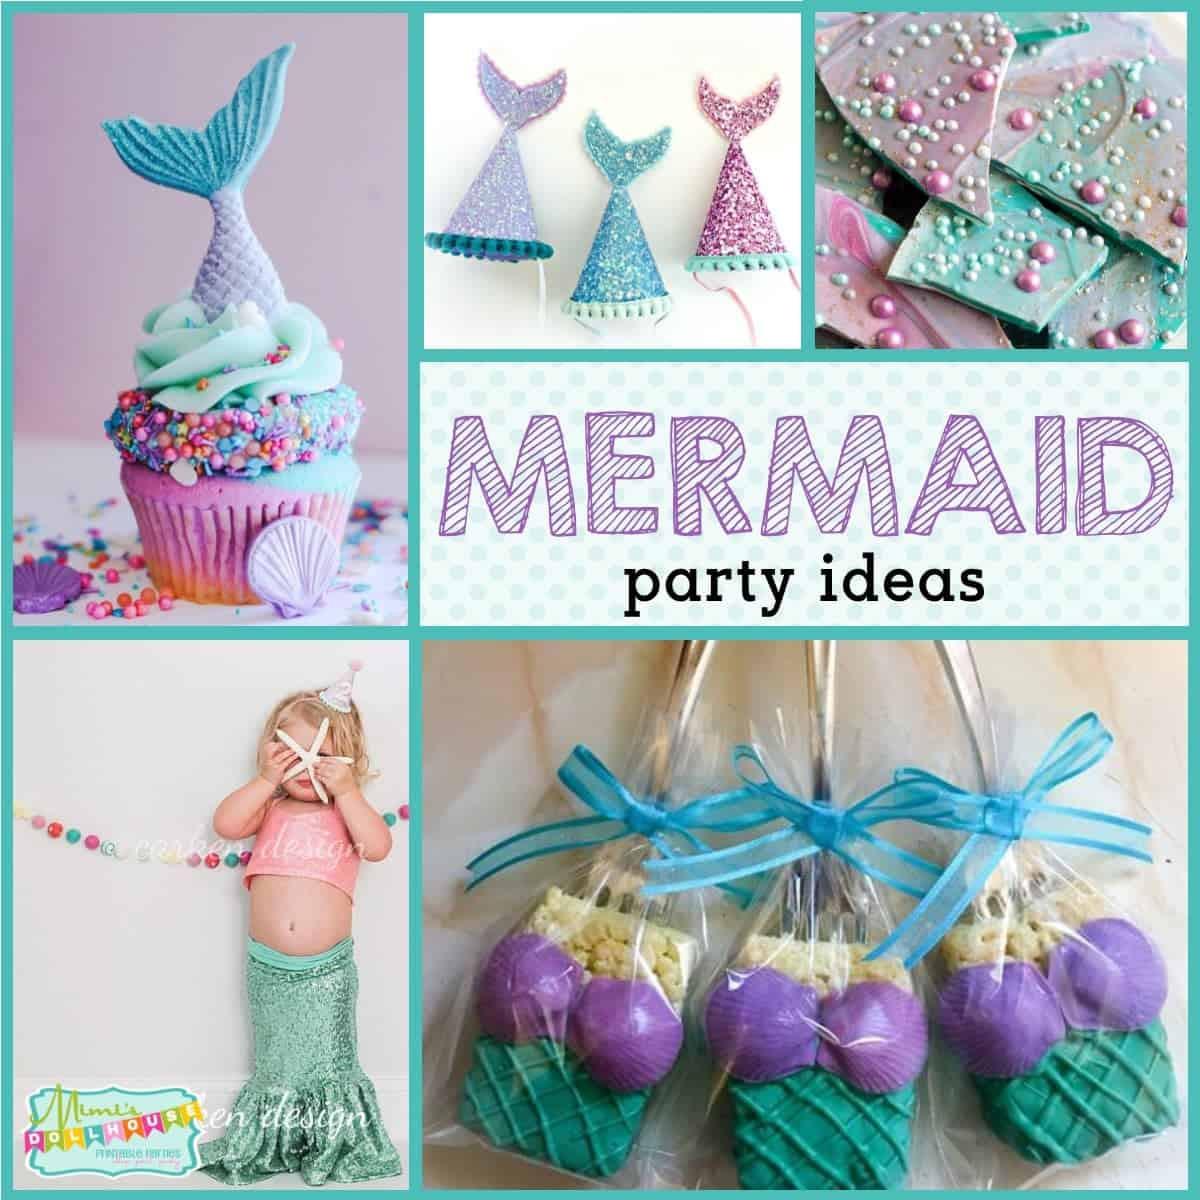 Mermaid Party Ideas 4 Year Old  Mermaid Party Mermaid Party Ideas Mimi s Dollhouse